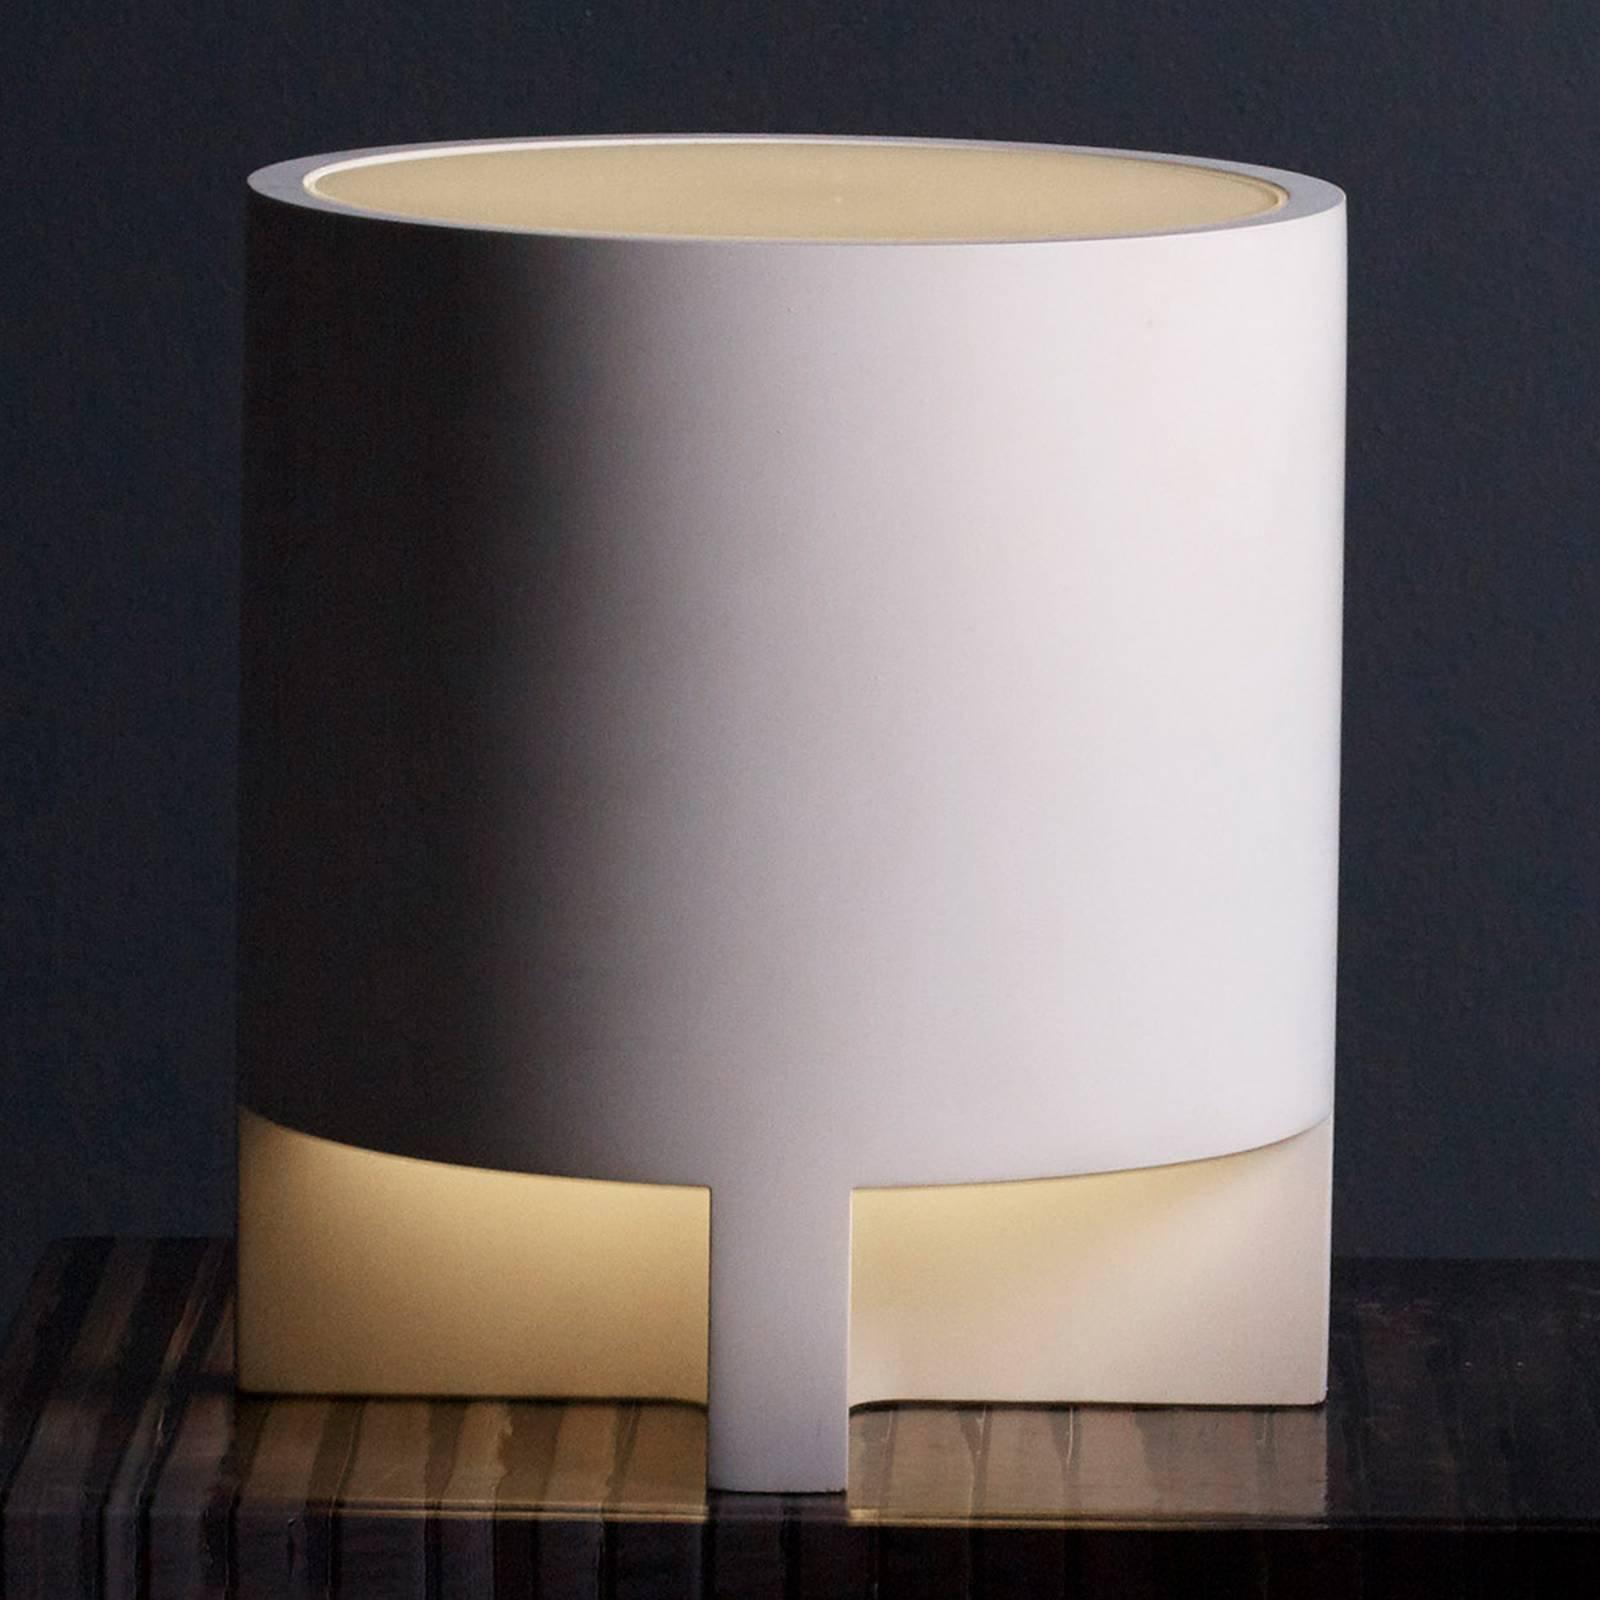 Astro Martello bordlampe Ø 18 cm